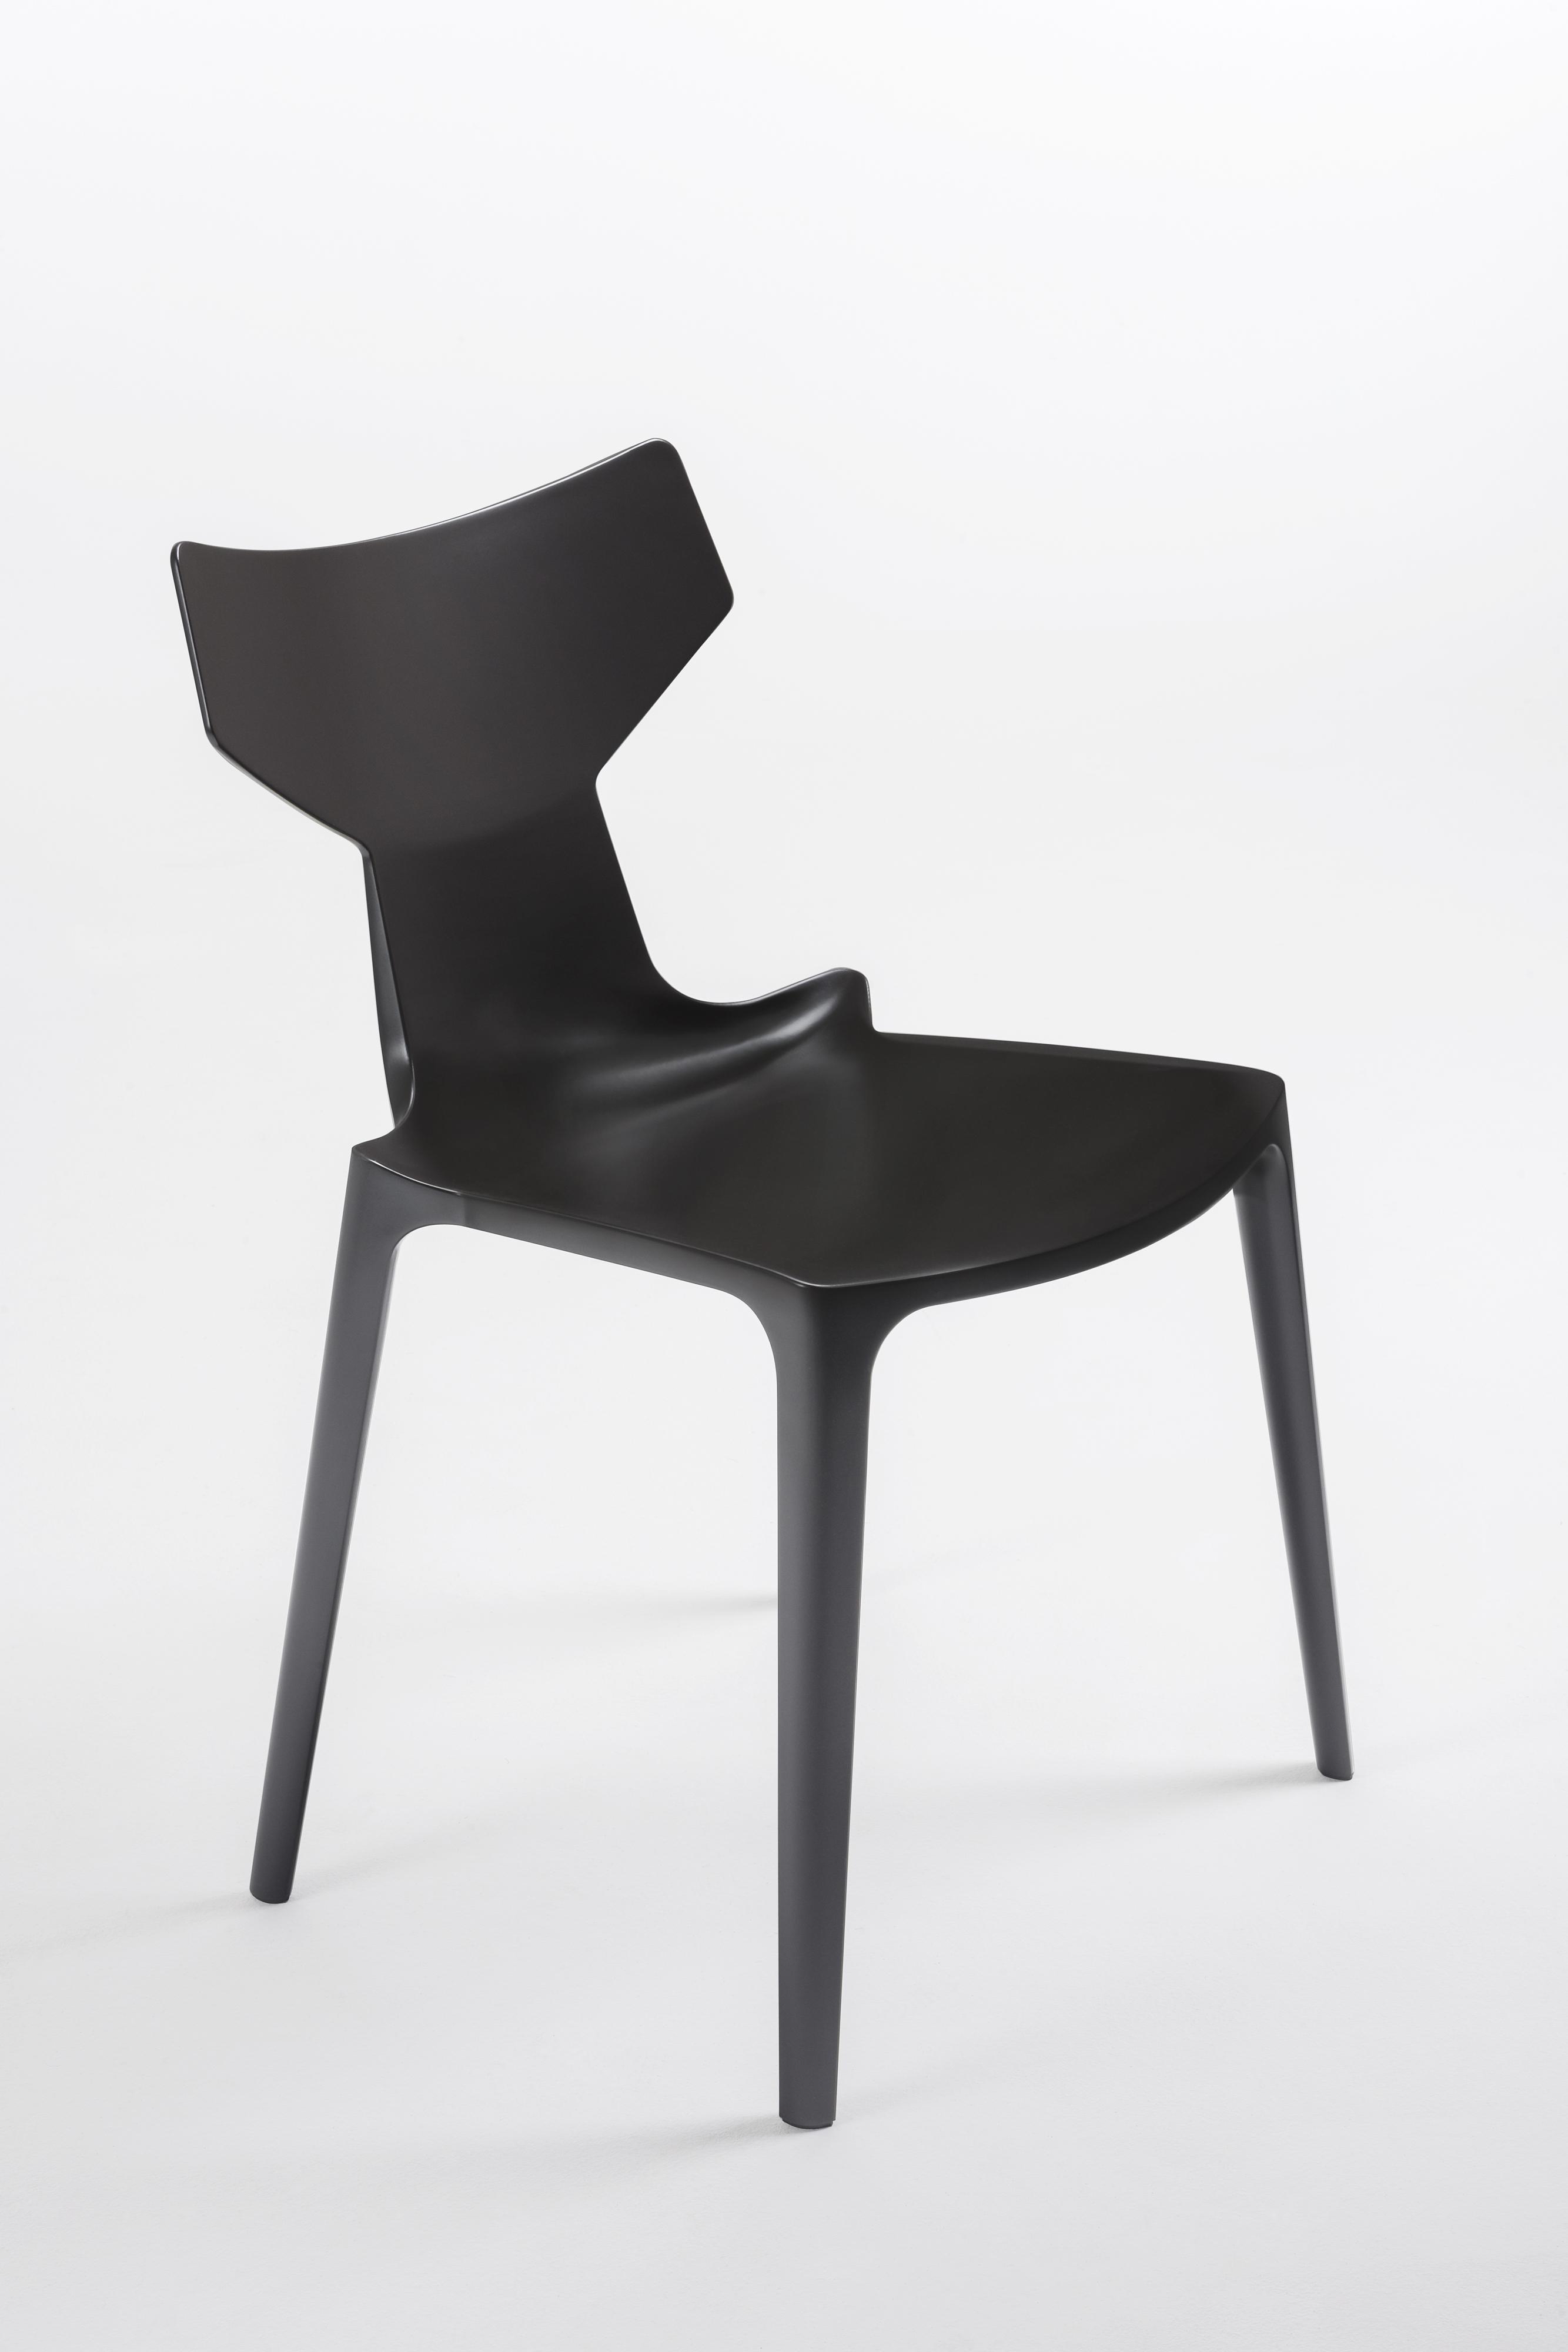 Organic chair design Antonio Citterio per Kartell Bioduratm  @softer marchio registrato, in esclusiva per Kartell.